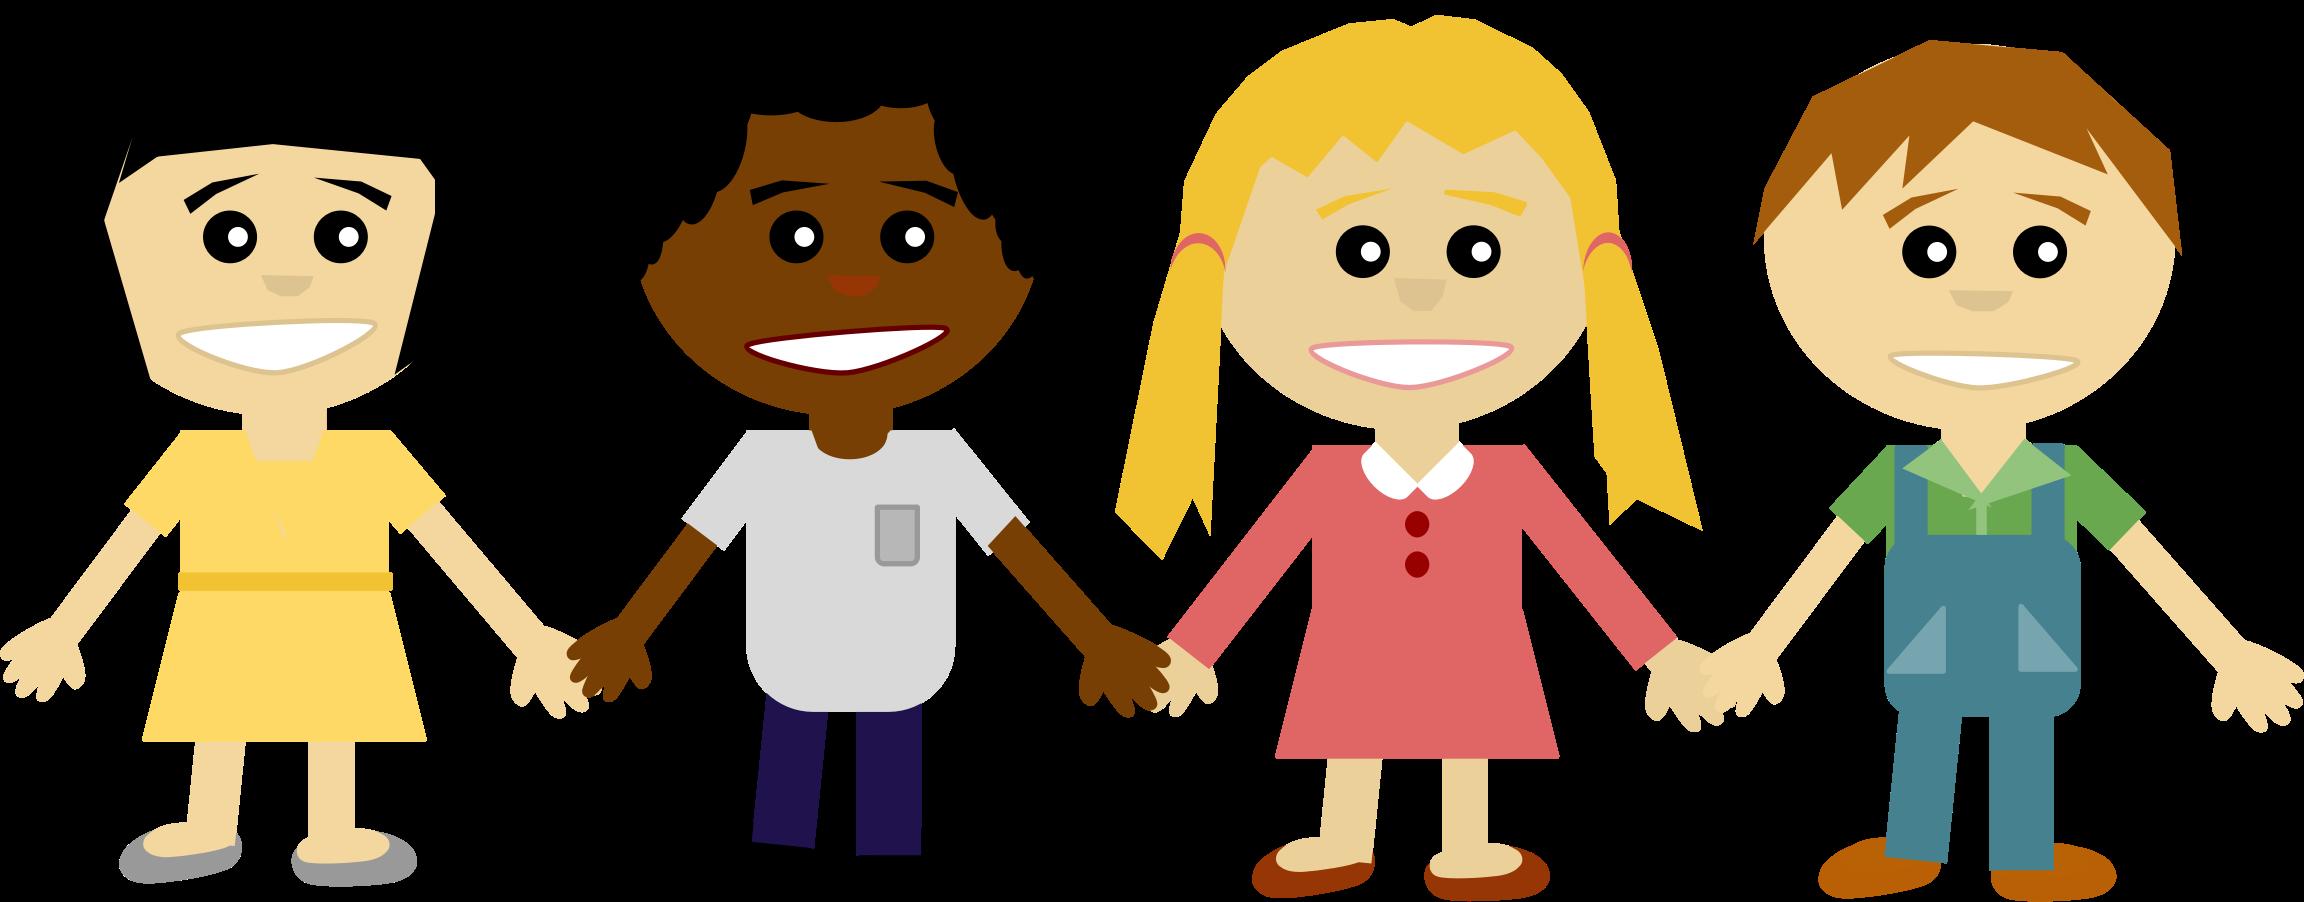 vector stock Kids worship clipart. Image for free children